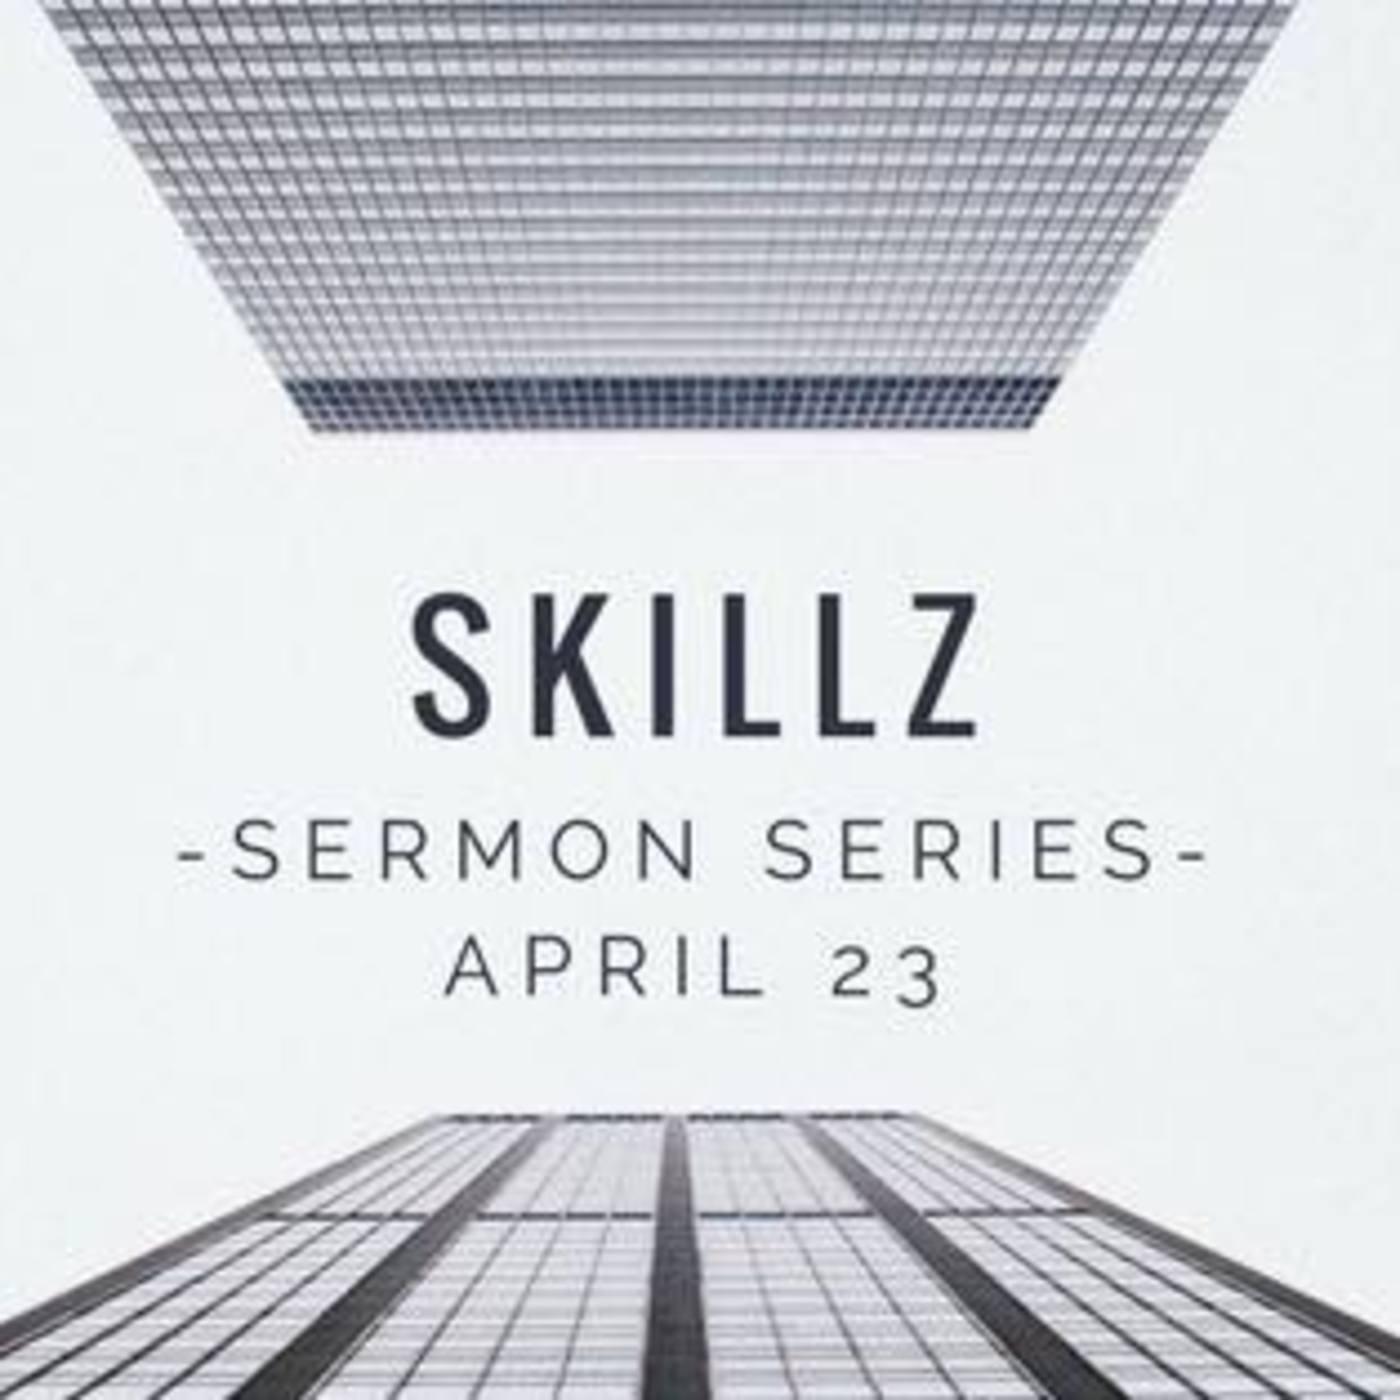 Skillz Series Introduction